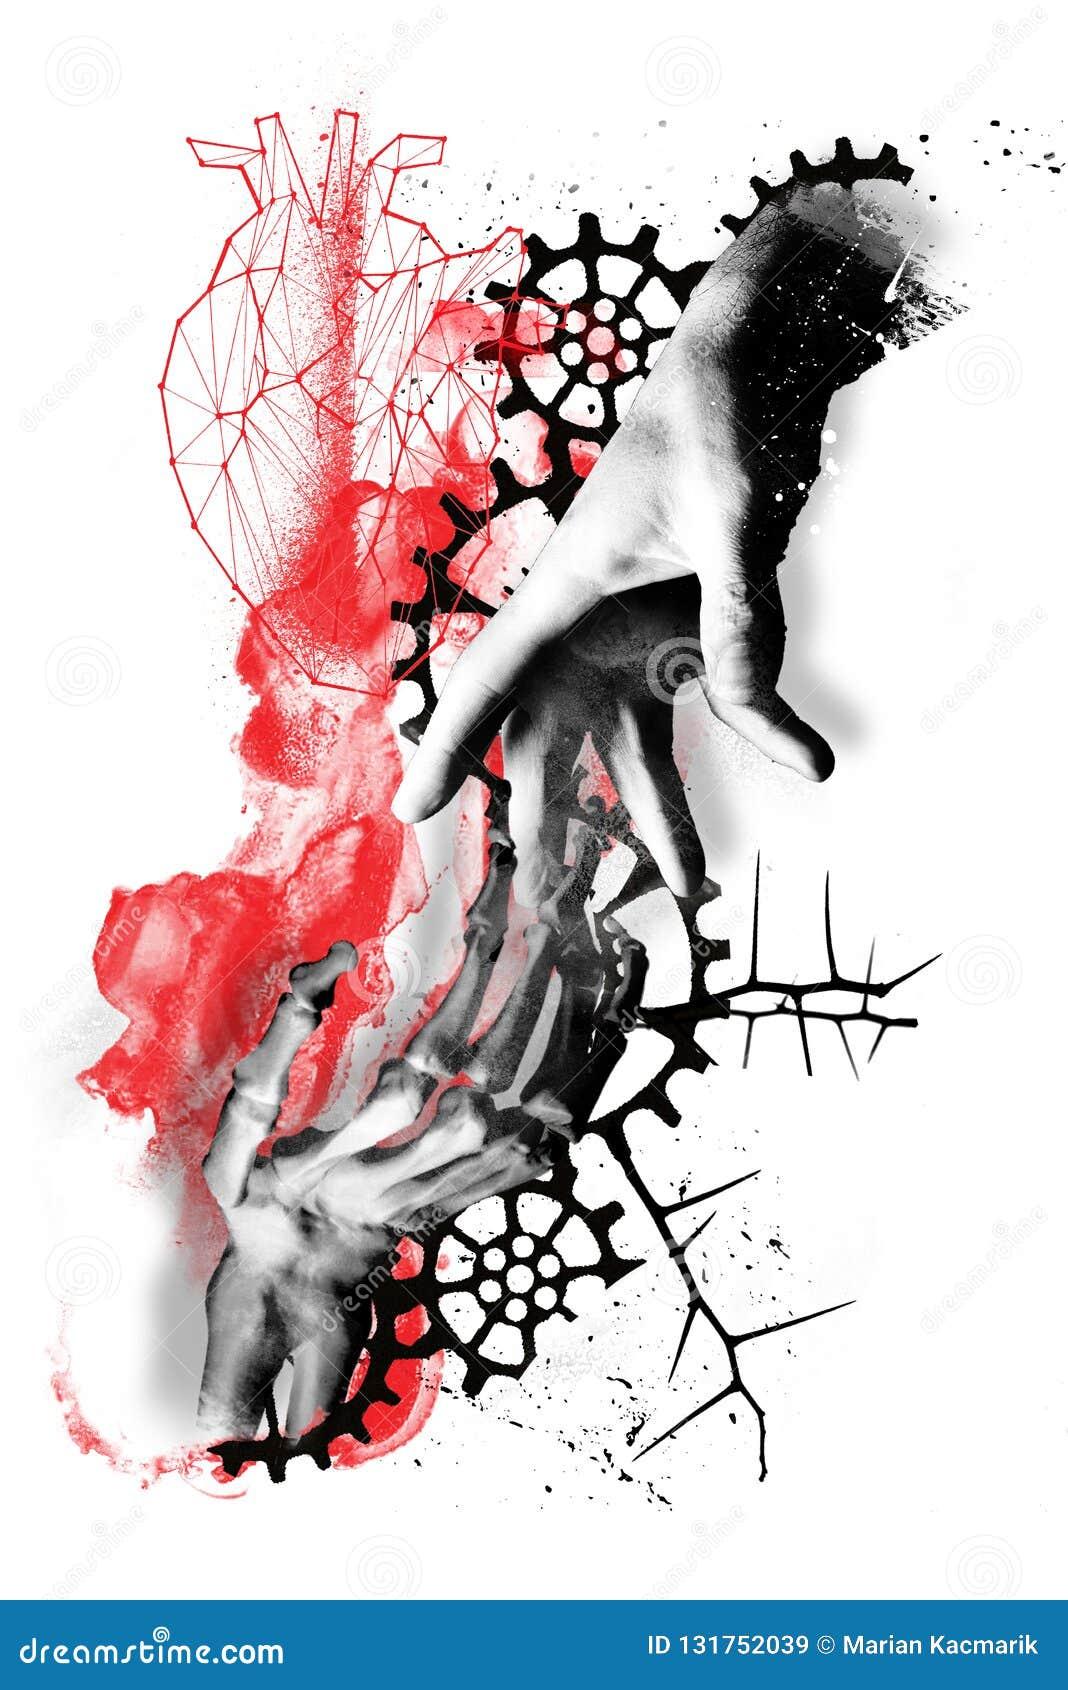 life dead abstract digital art face trash polka grunge color smudge ink tattoo digital art trash polka grunge life dead heart 131752039 - Trash Polka Tattoo Art